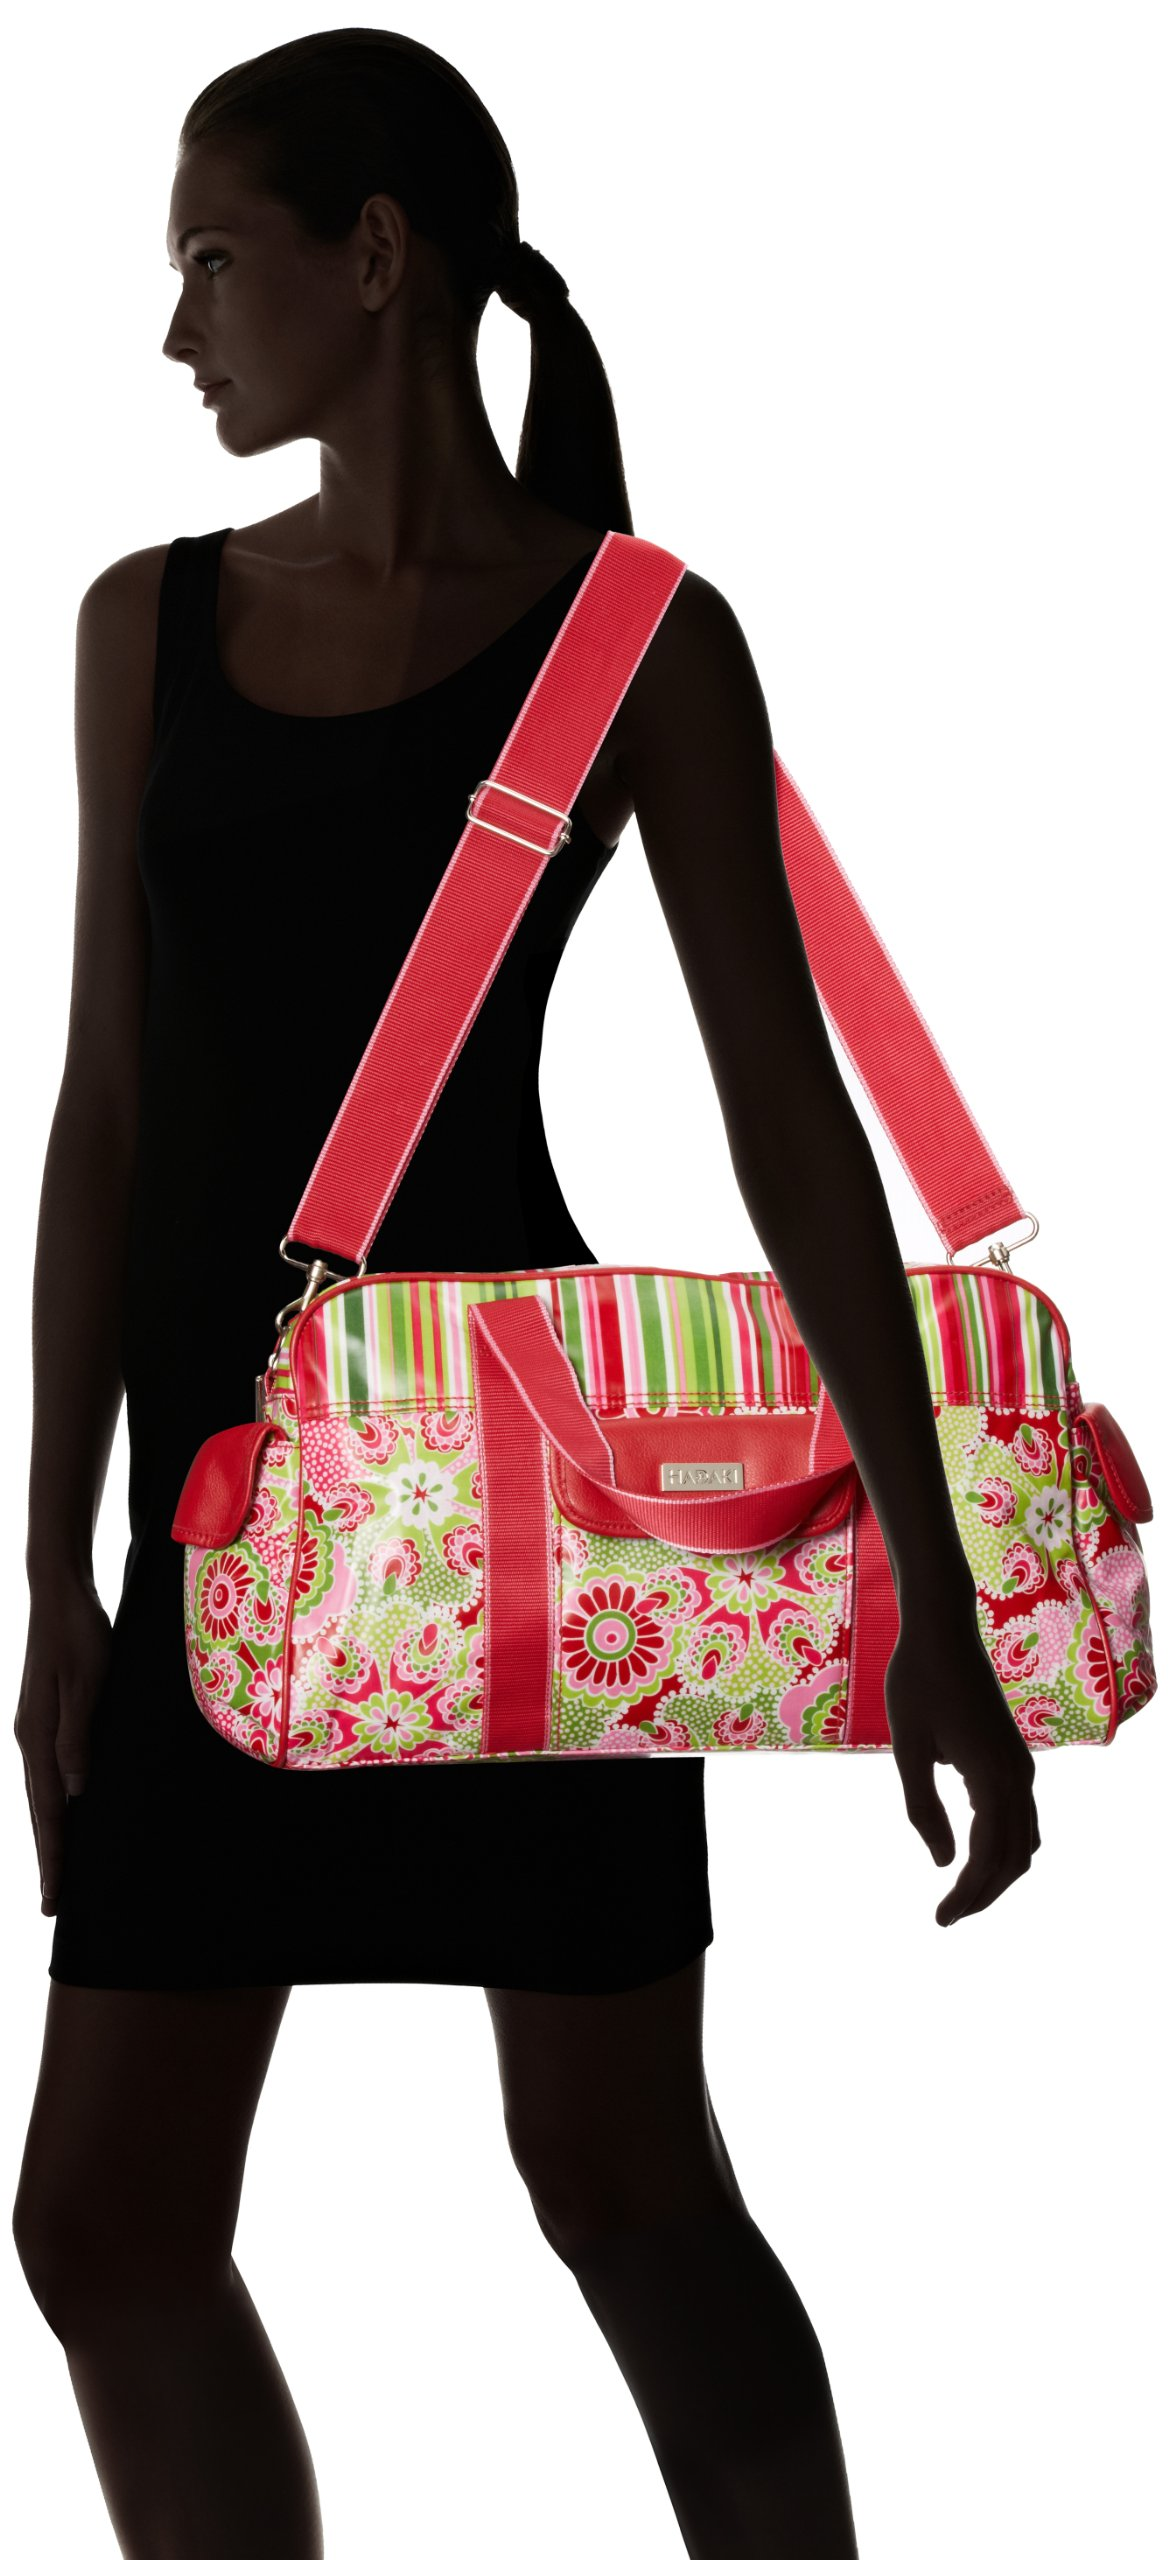 Hadaki Cool HDK826 Duffle Bag,Jazz Ruby,One Size by HADAKI (Image #7)